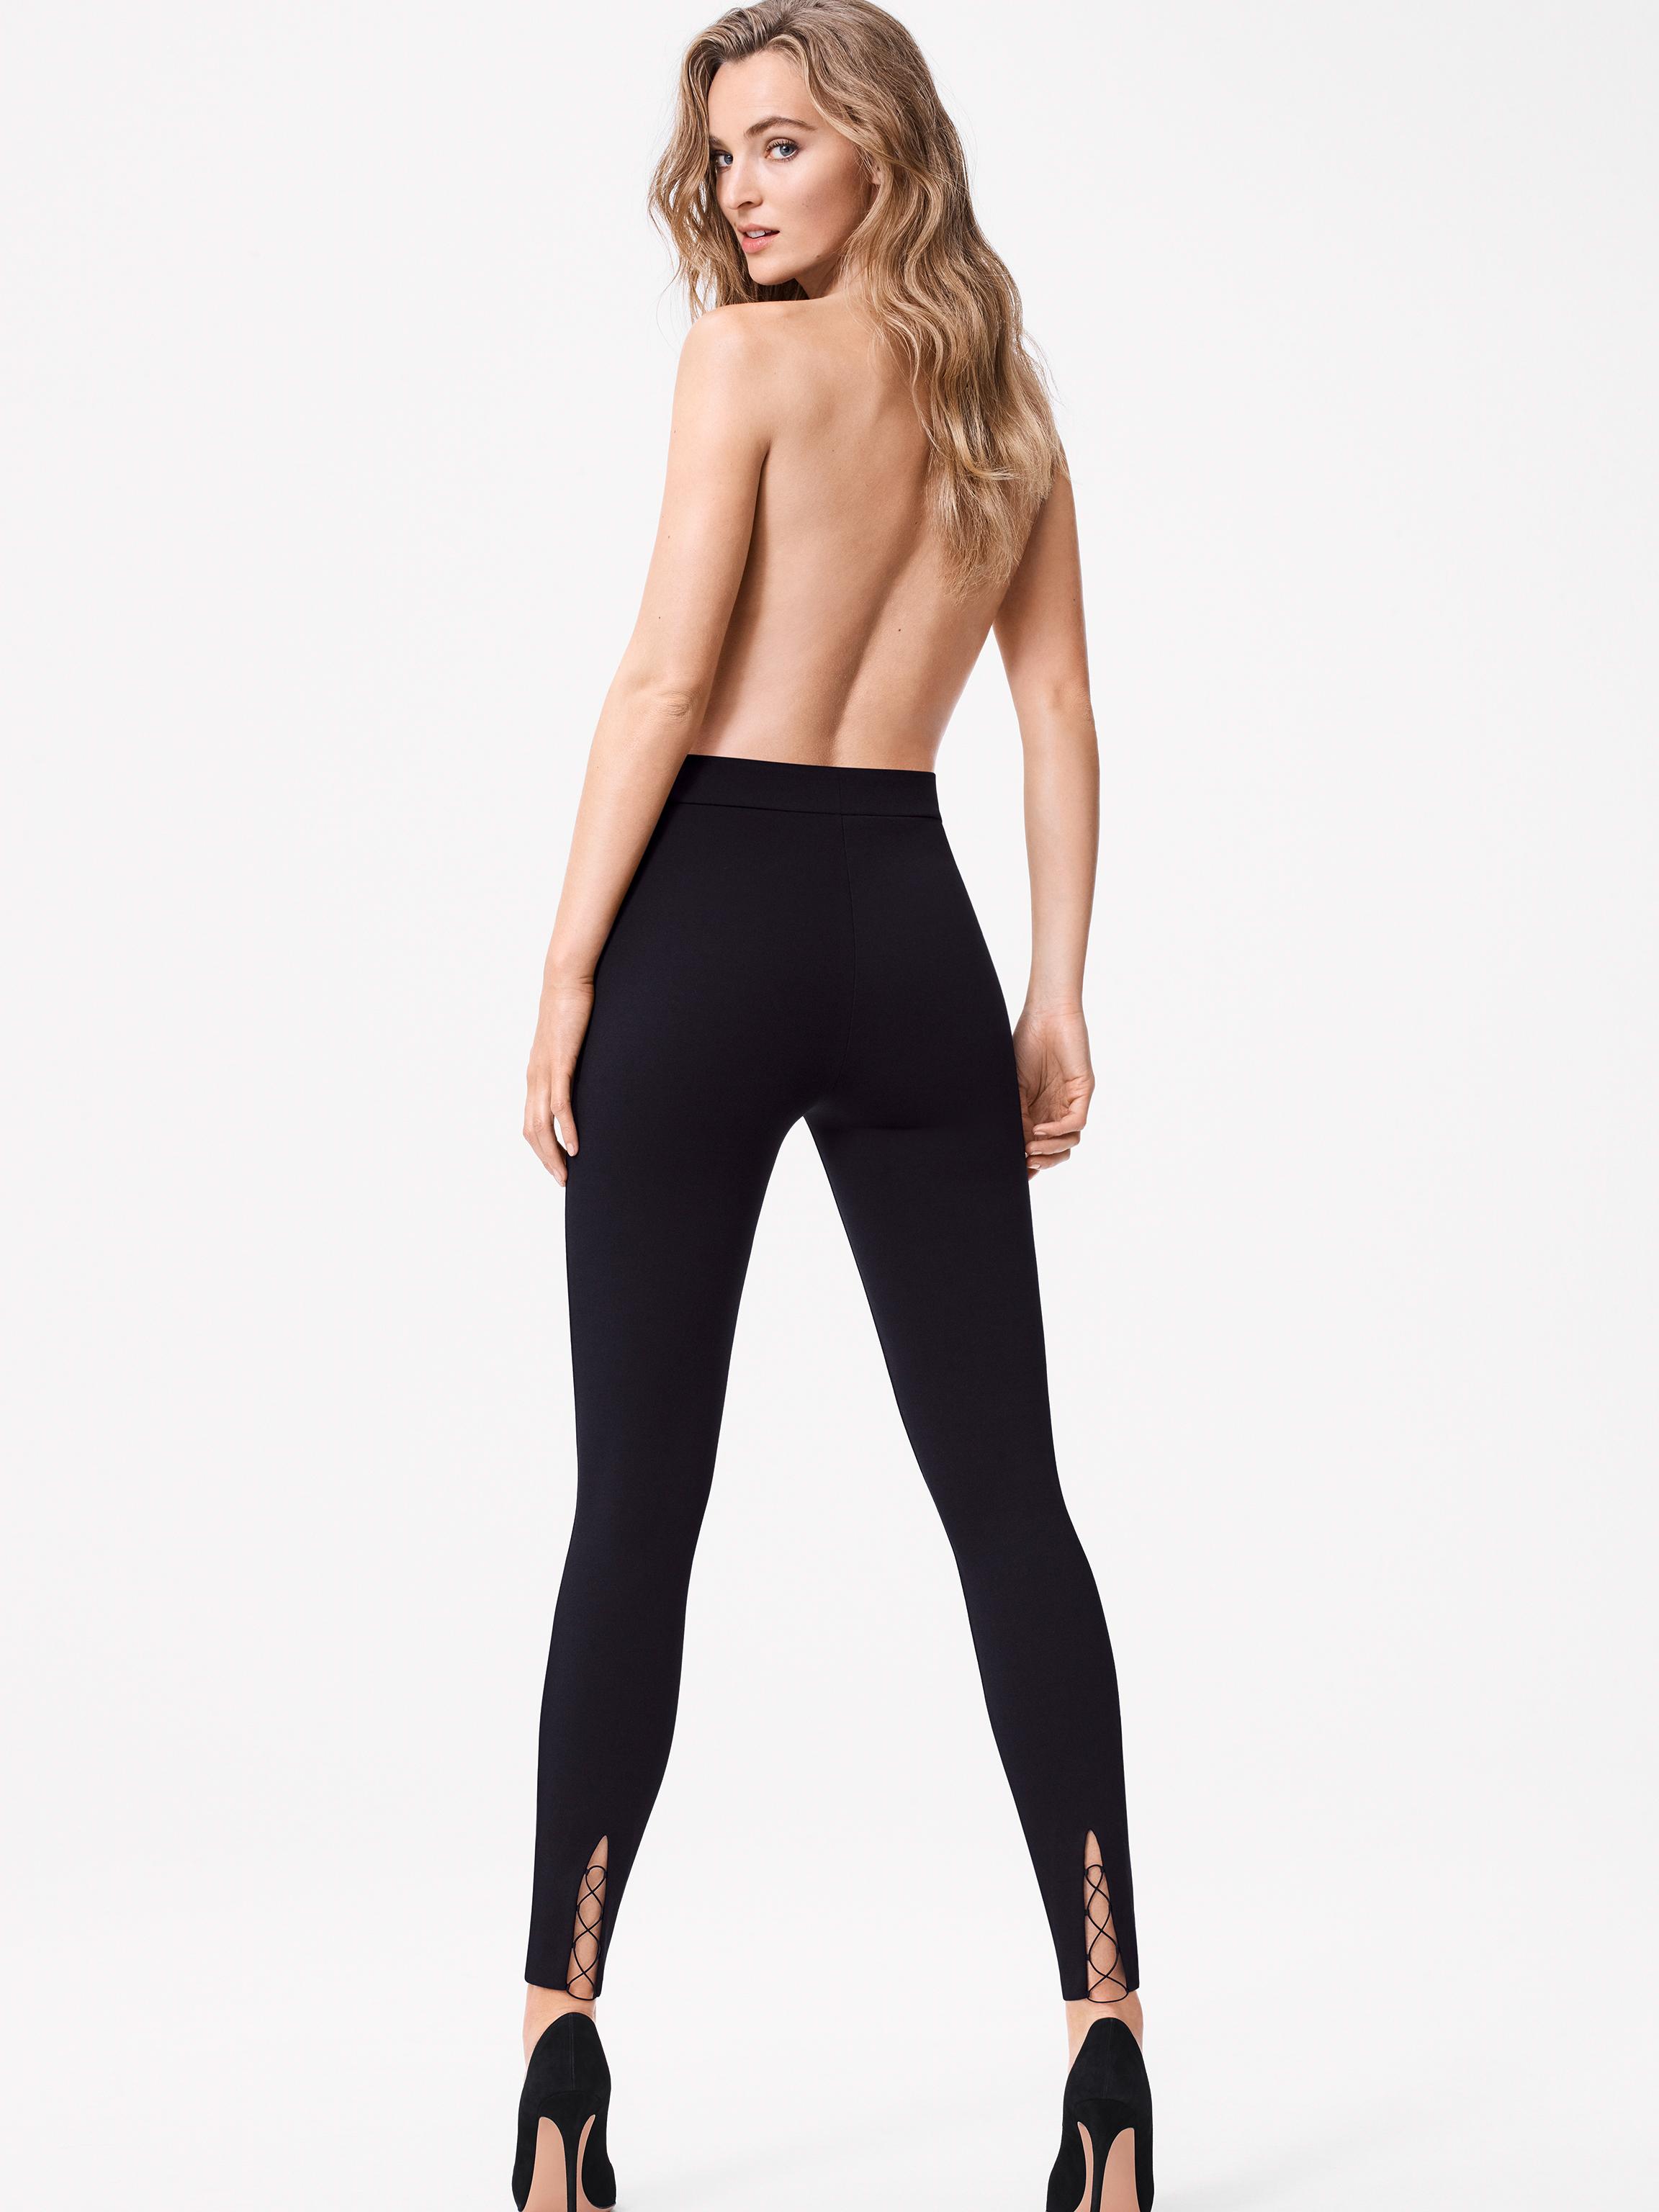 Grace Leggings - 7005 - XS | Bekleidung > Hosen > Leggings | Black | Jersey | Wolford